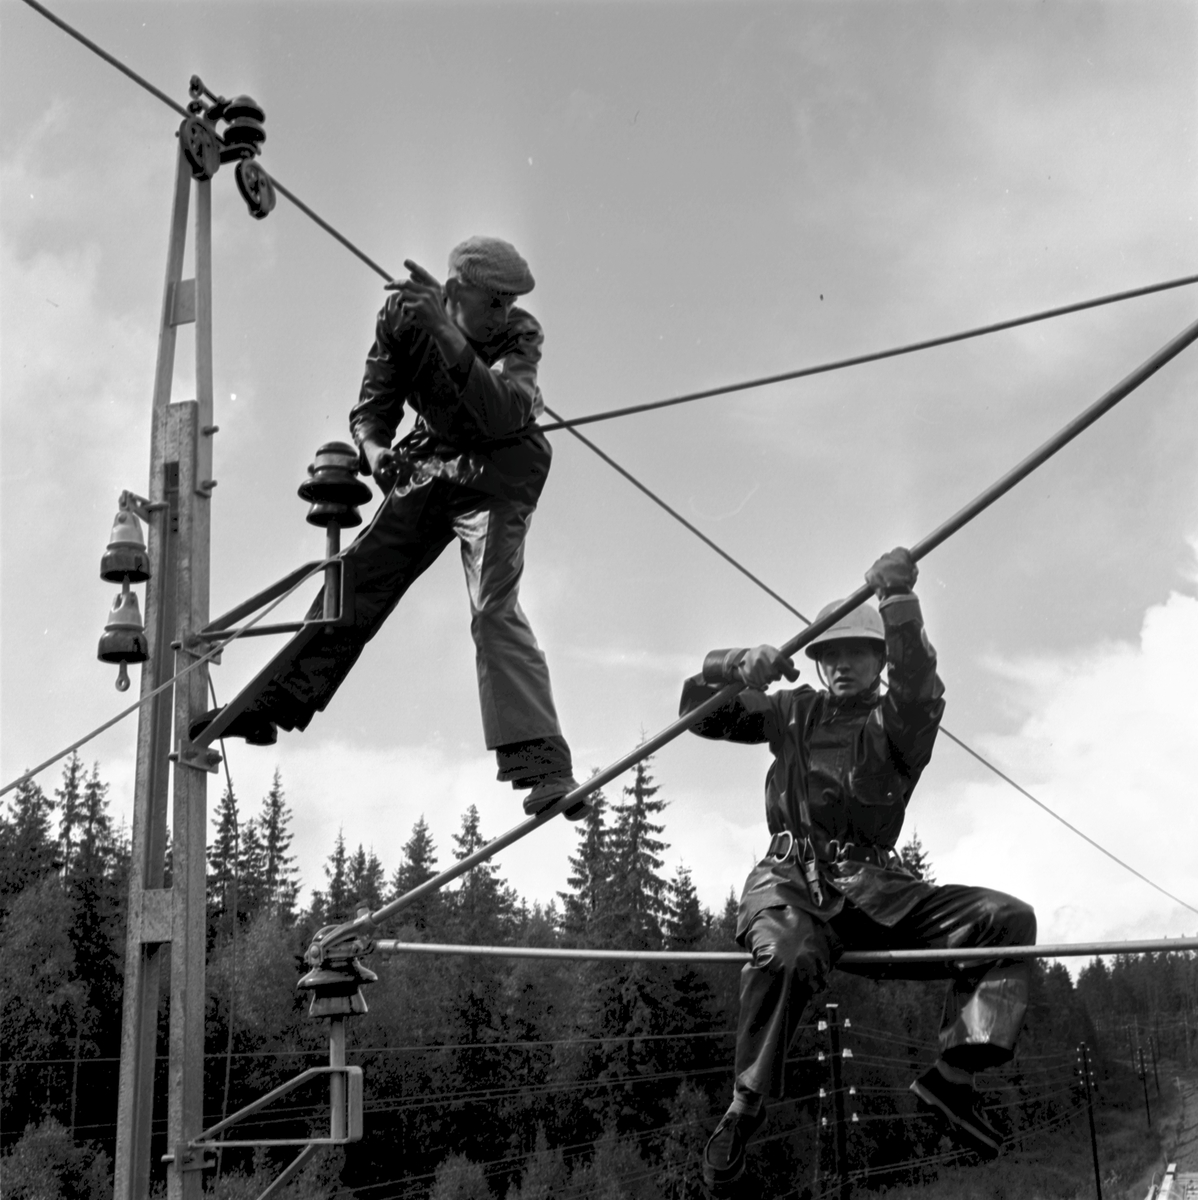 El-arbeten, Borås-Gnosjö